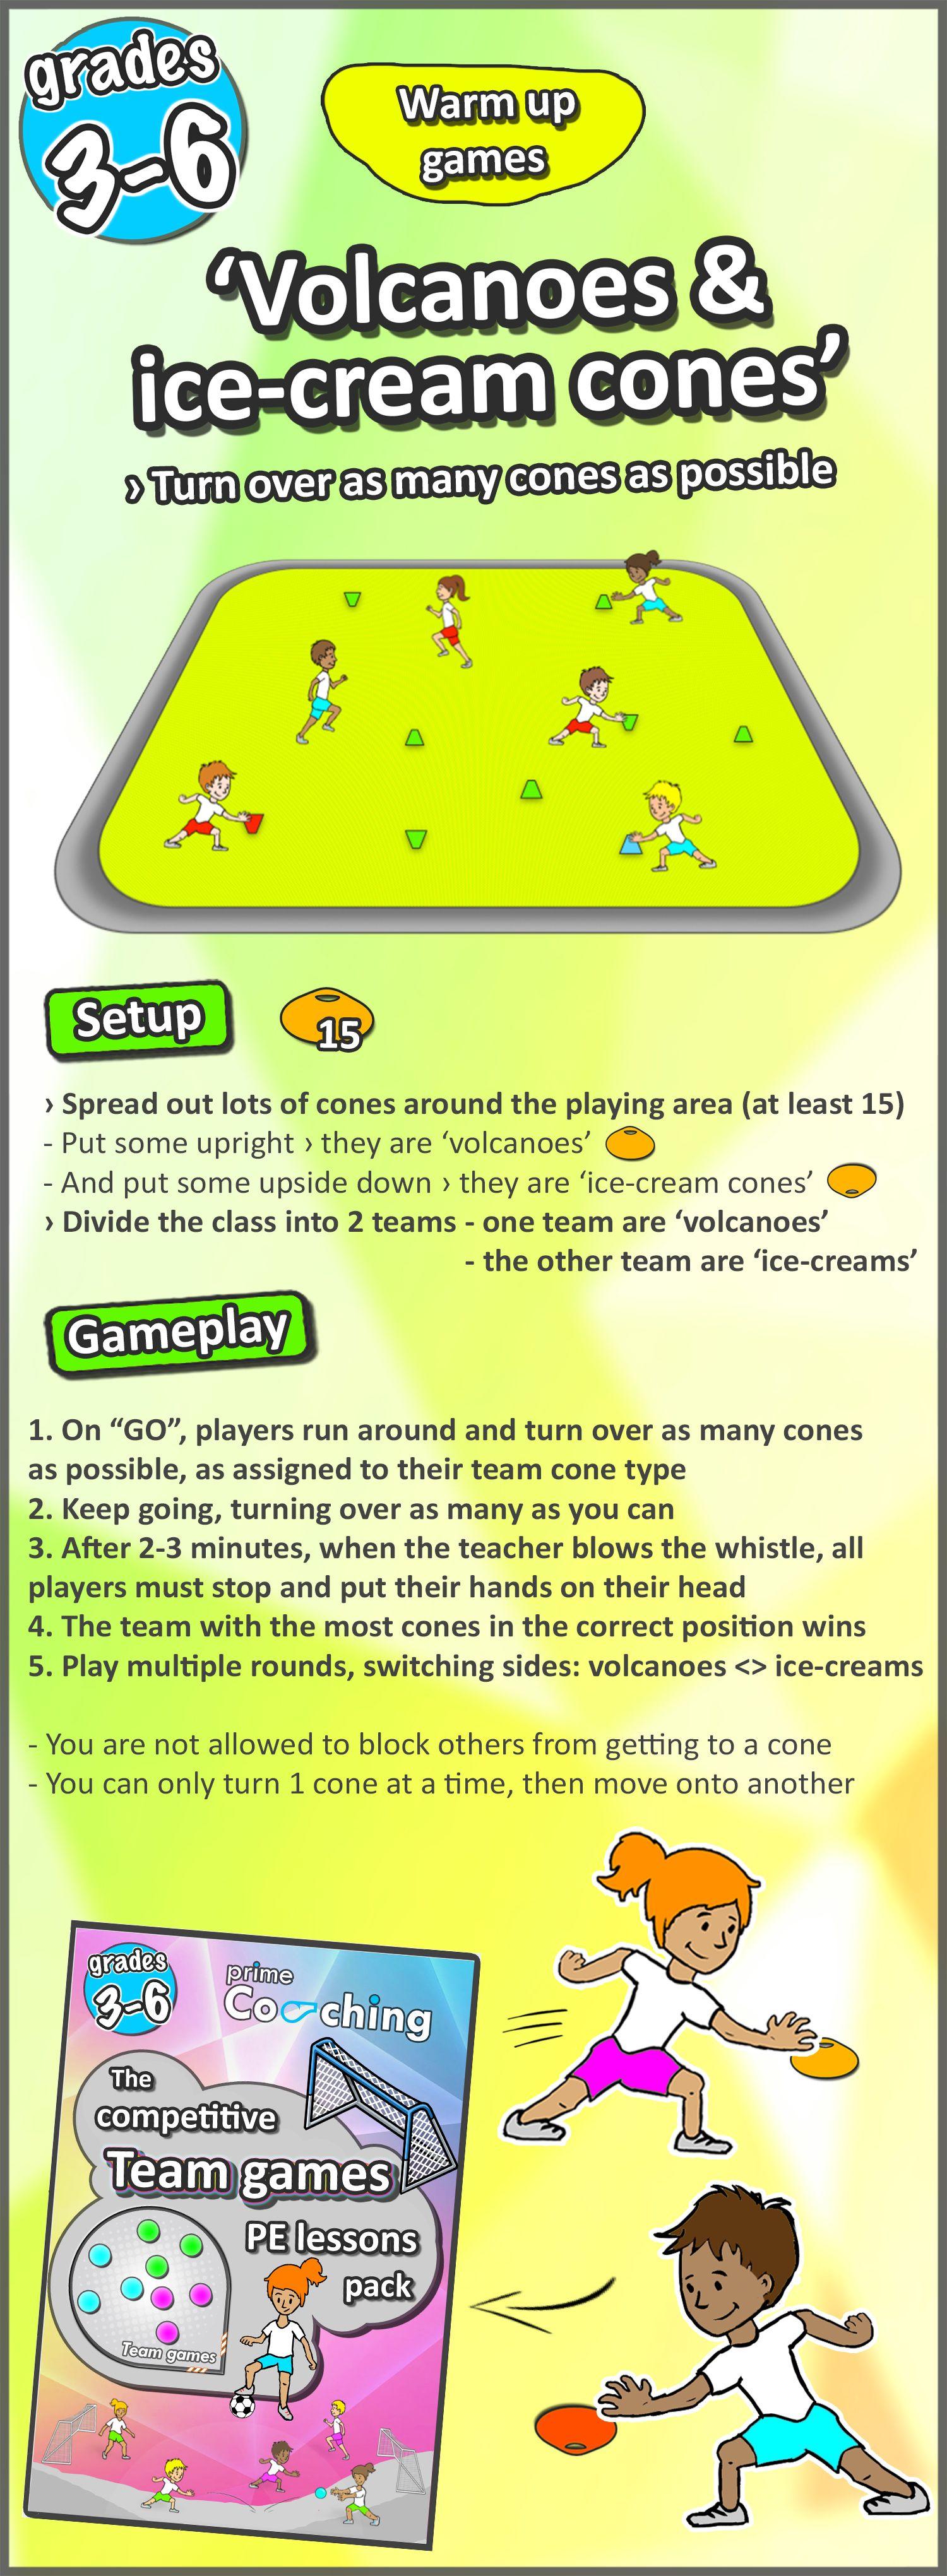 8 FREE PE Sport LESSON Warm Up Games Grades 3 6